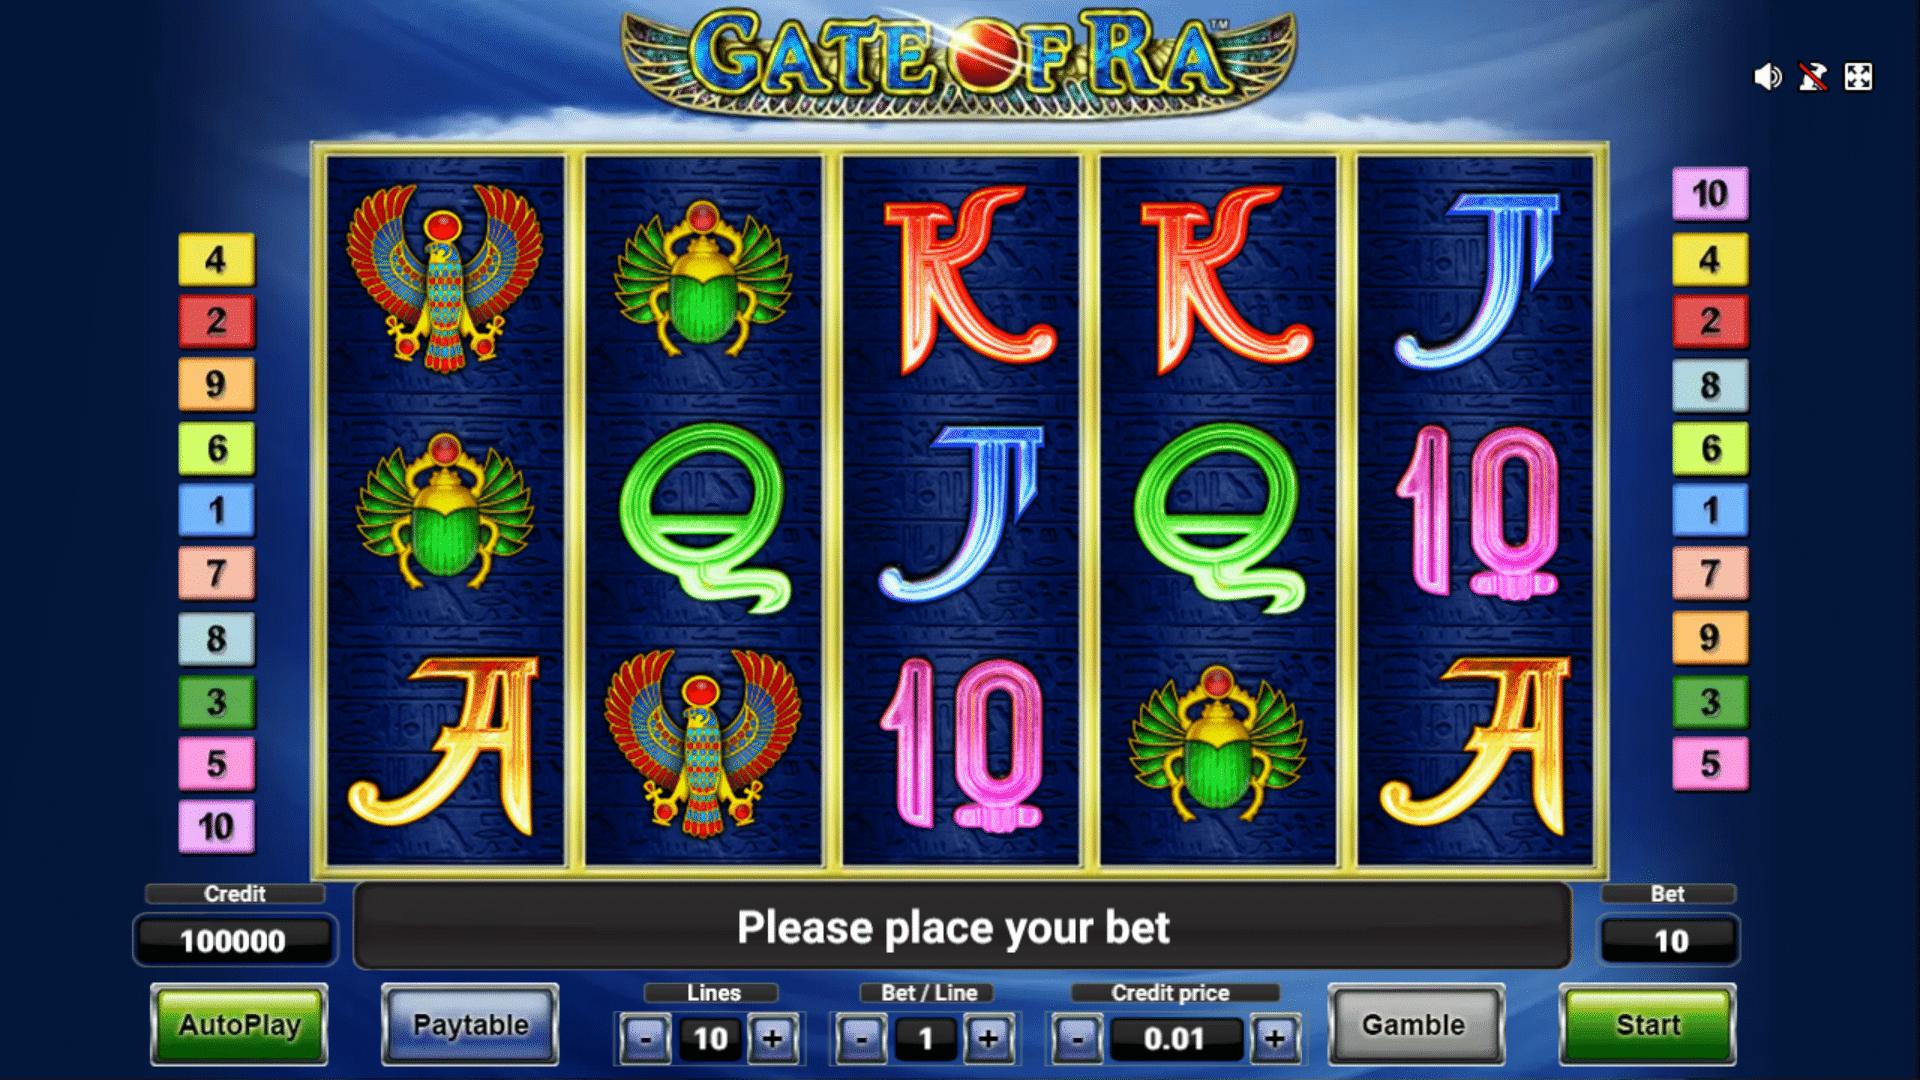 Slot Gate Of Ra